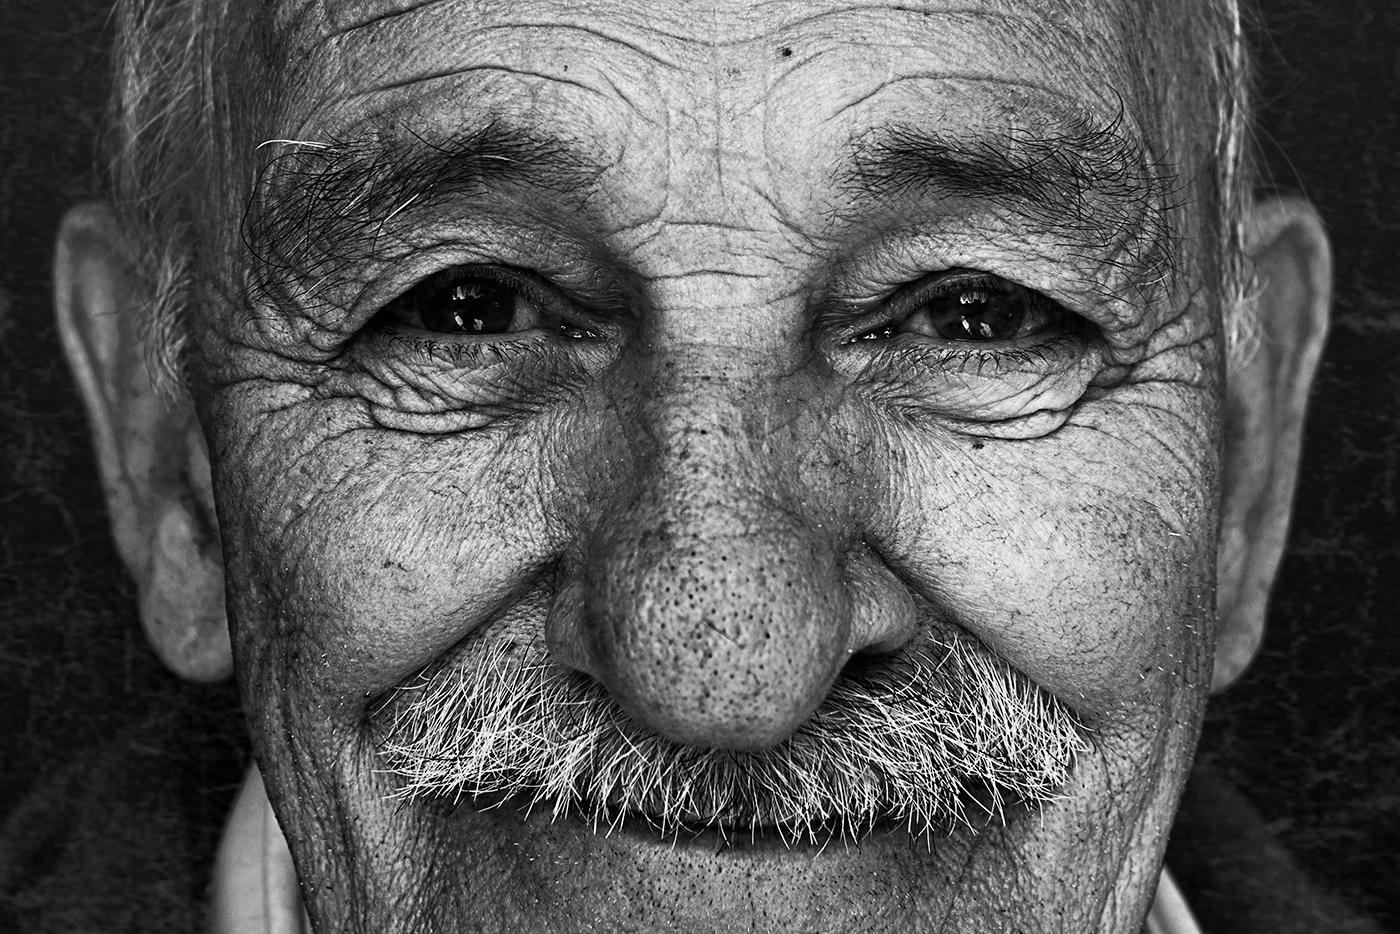 photo portrait Fotografia biancoenero blackandwhite photoshop Nikon nikond800 oldman fantastic